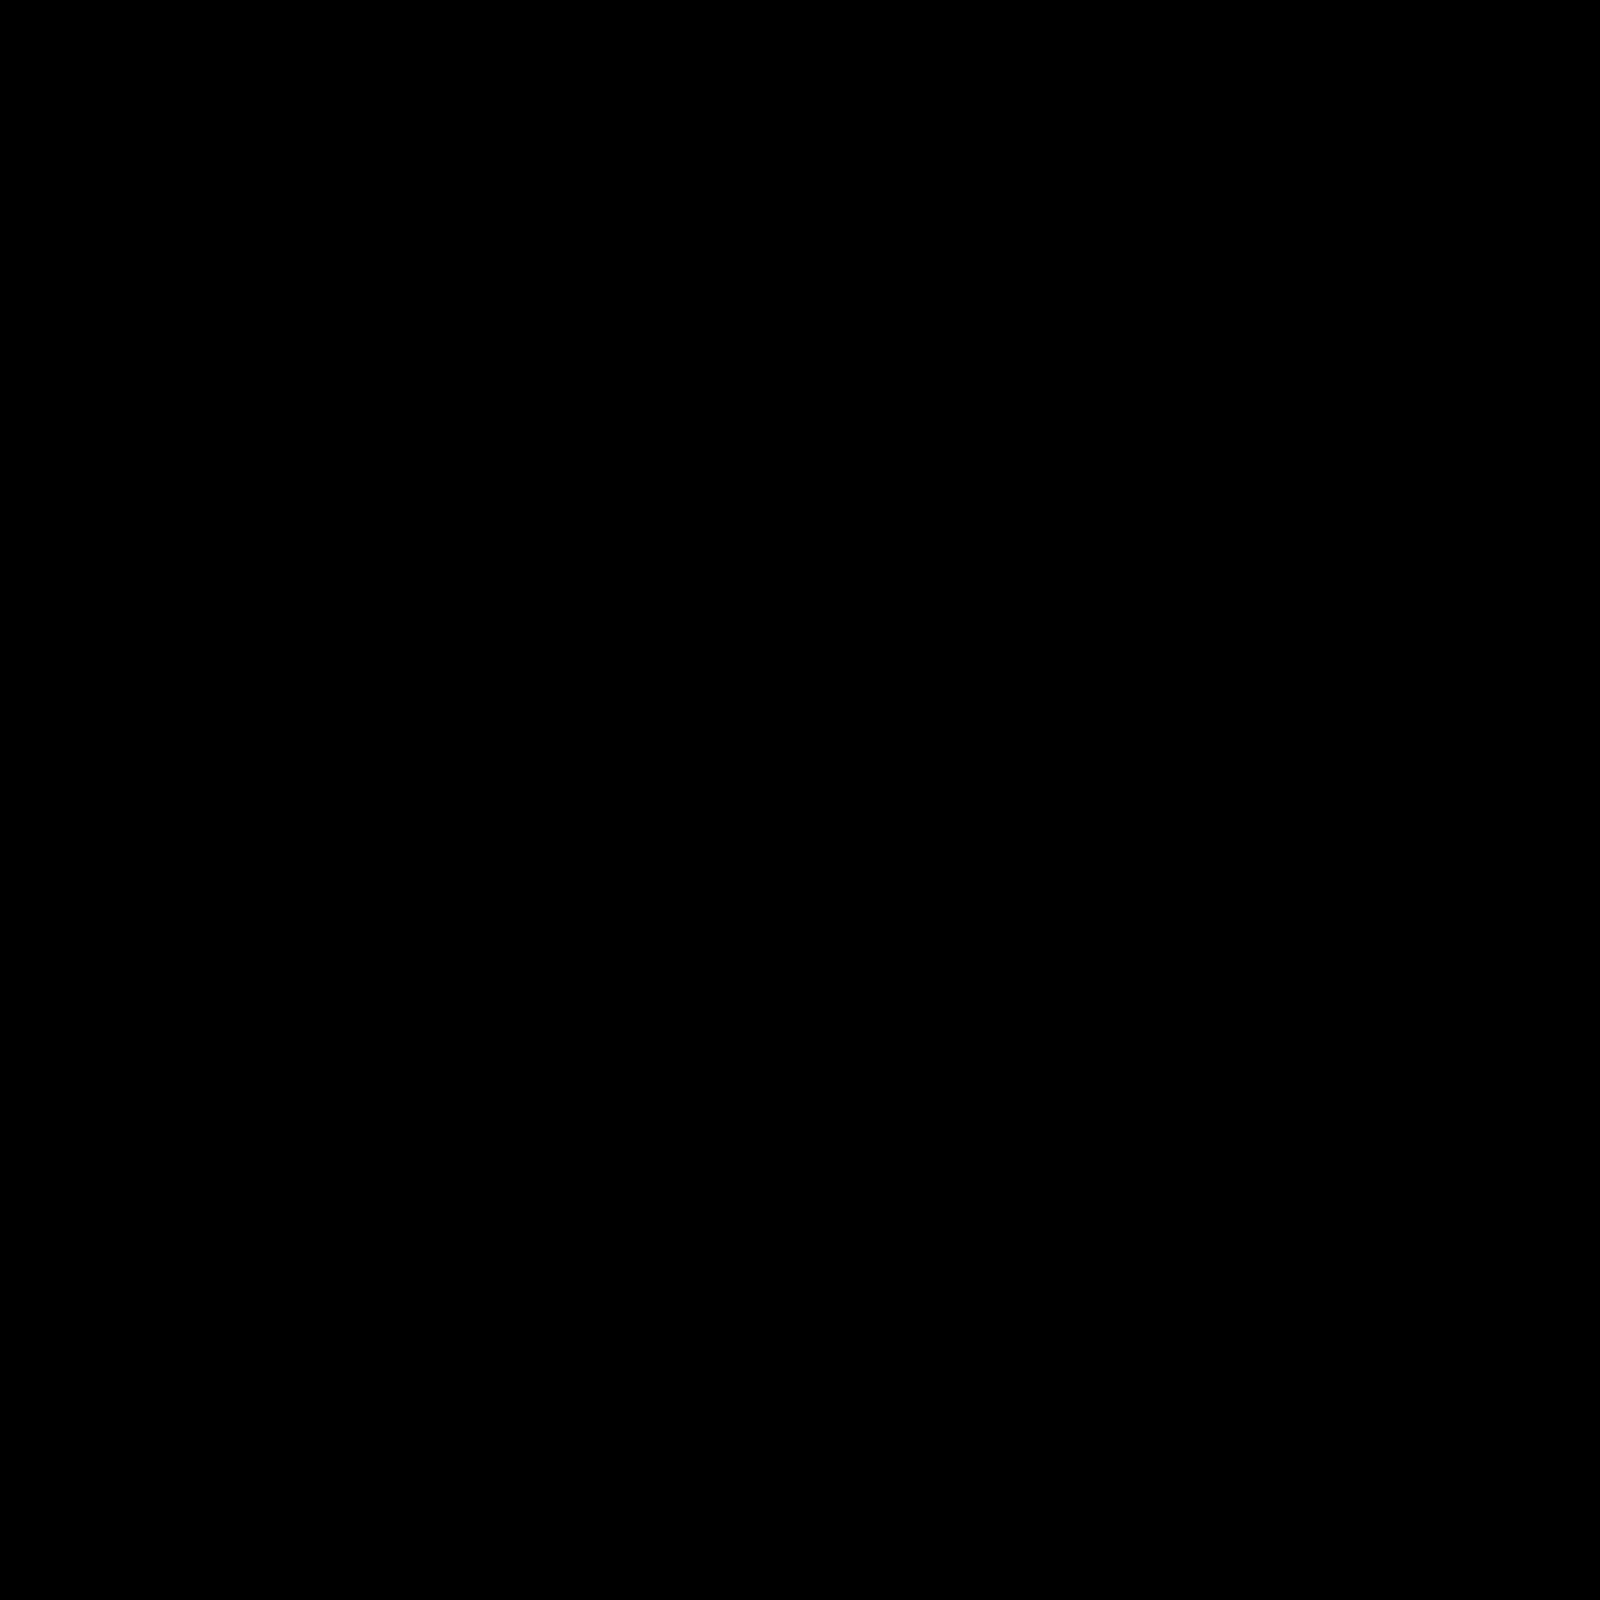 Prom icon